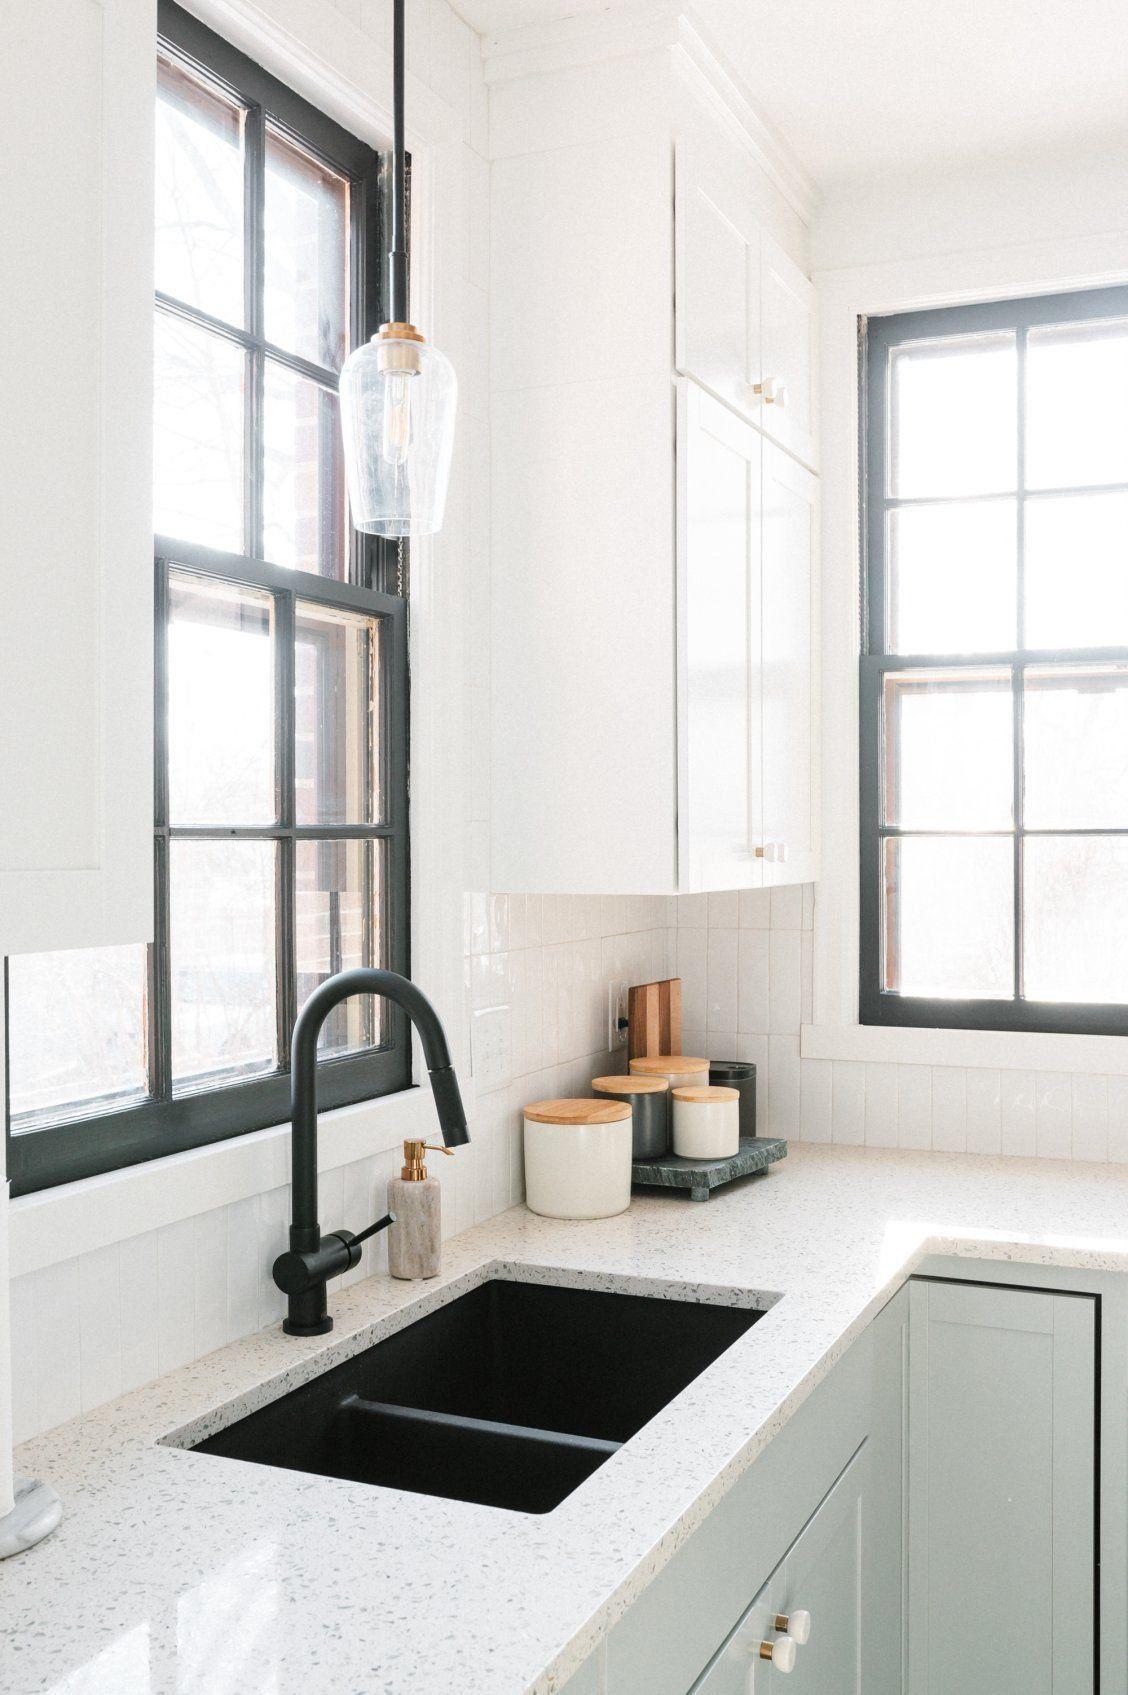 Pin on black kitchen faucet